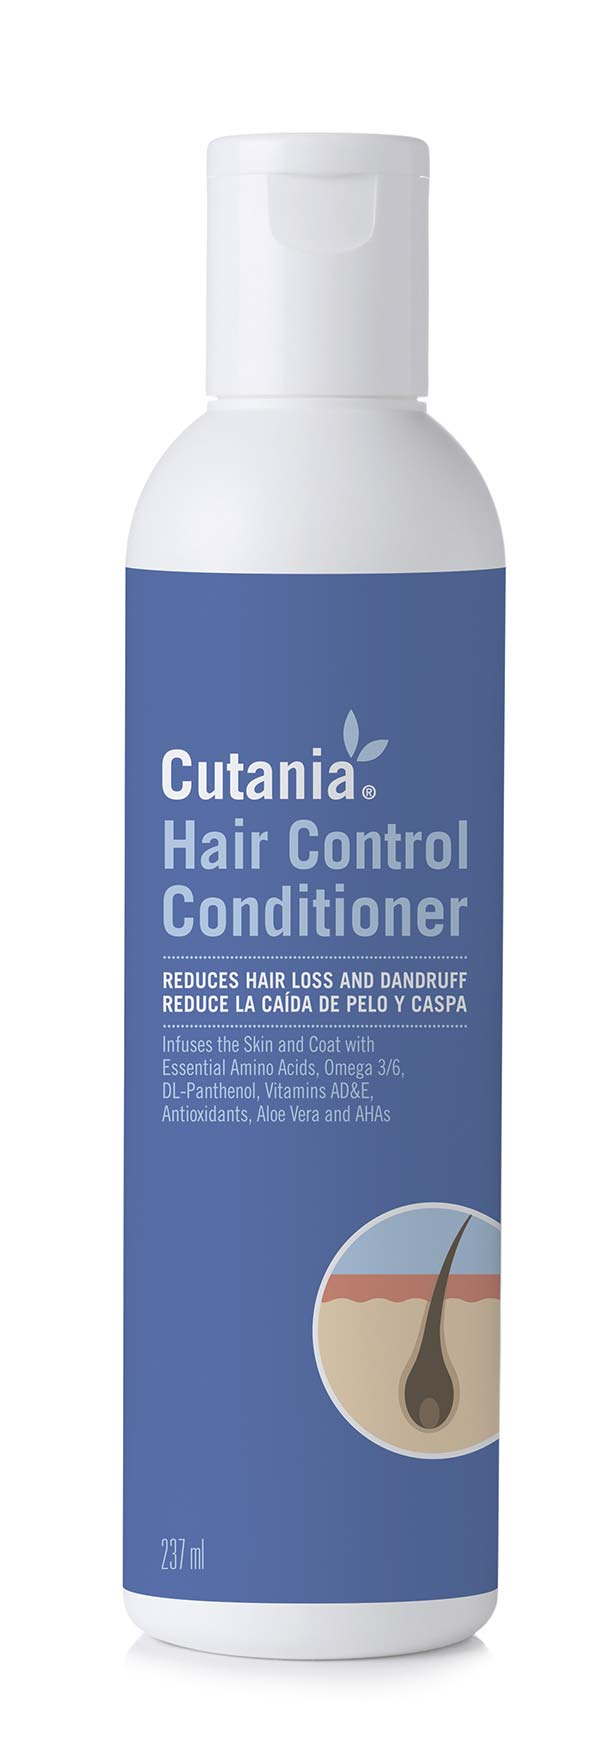 CUTANIA HAIR CONTROL CONDITIONER 237 ML